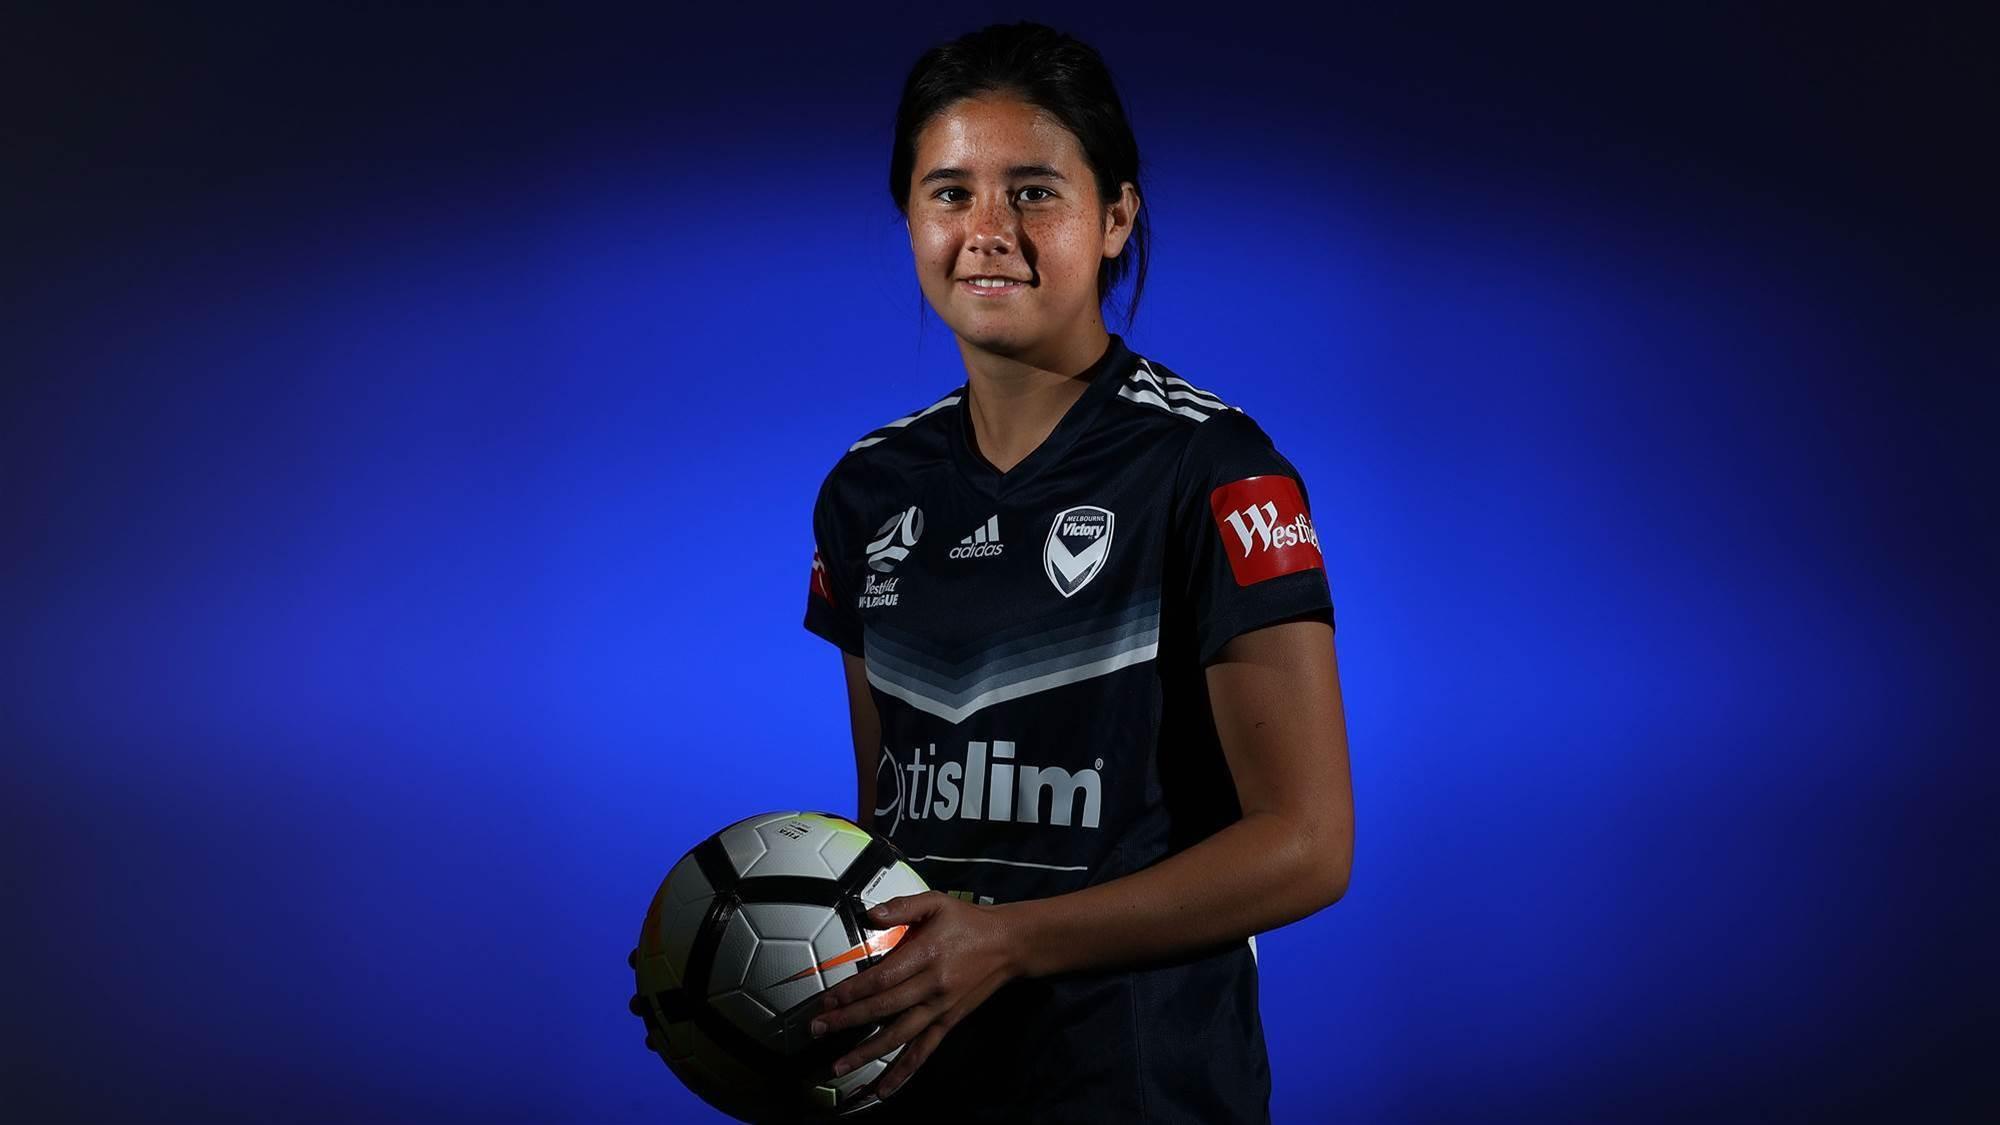 15-year-old's Matildas dream